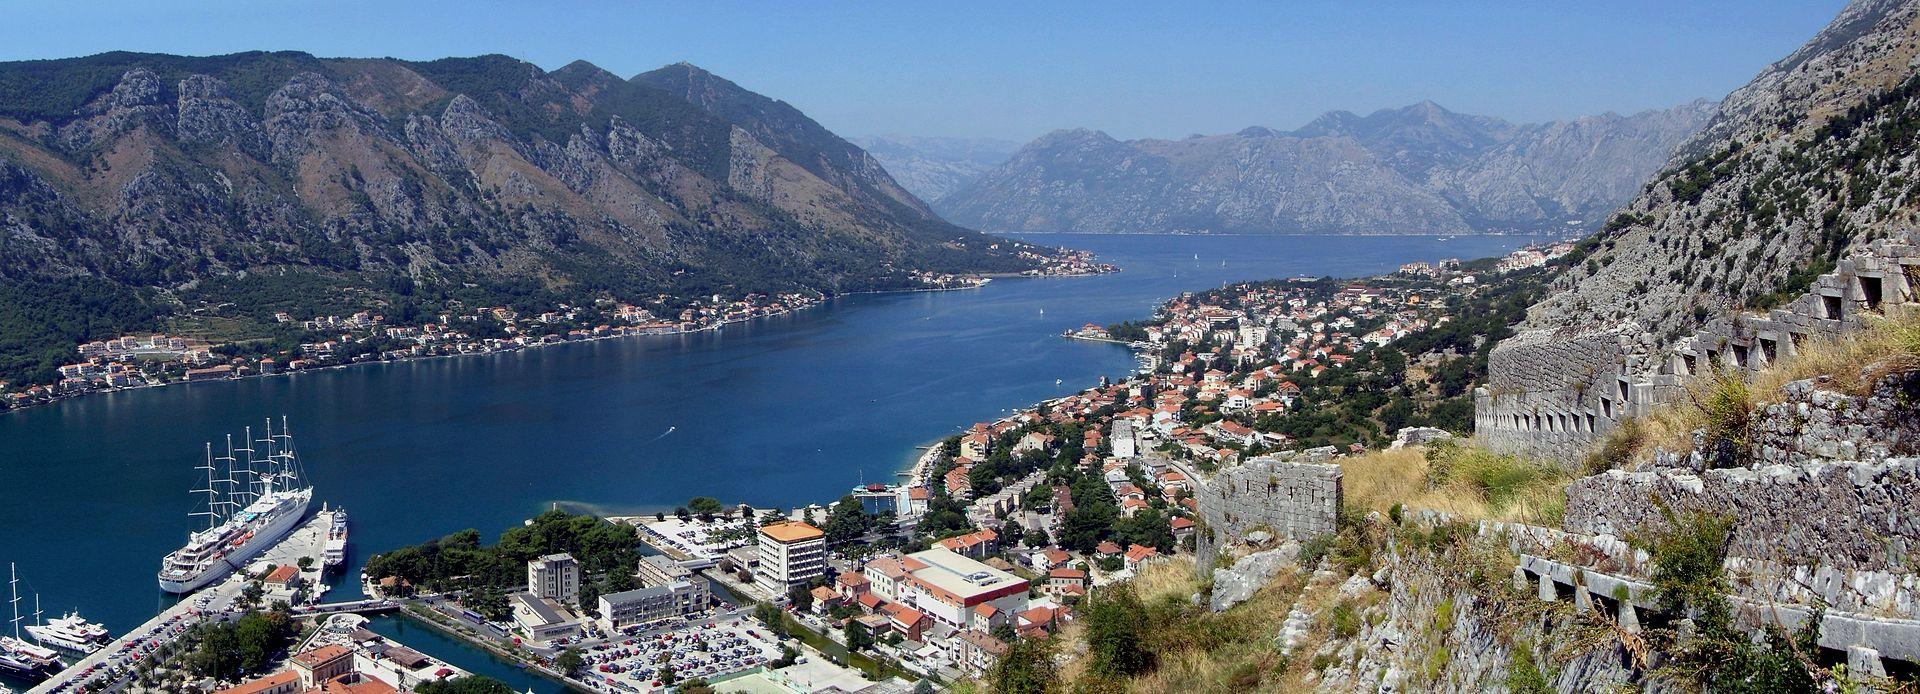 Kotor letovanje cene aranžmana izleti Crna gora